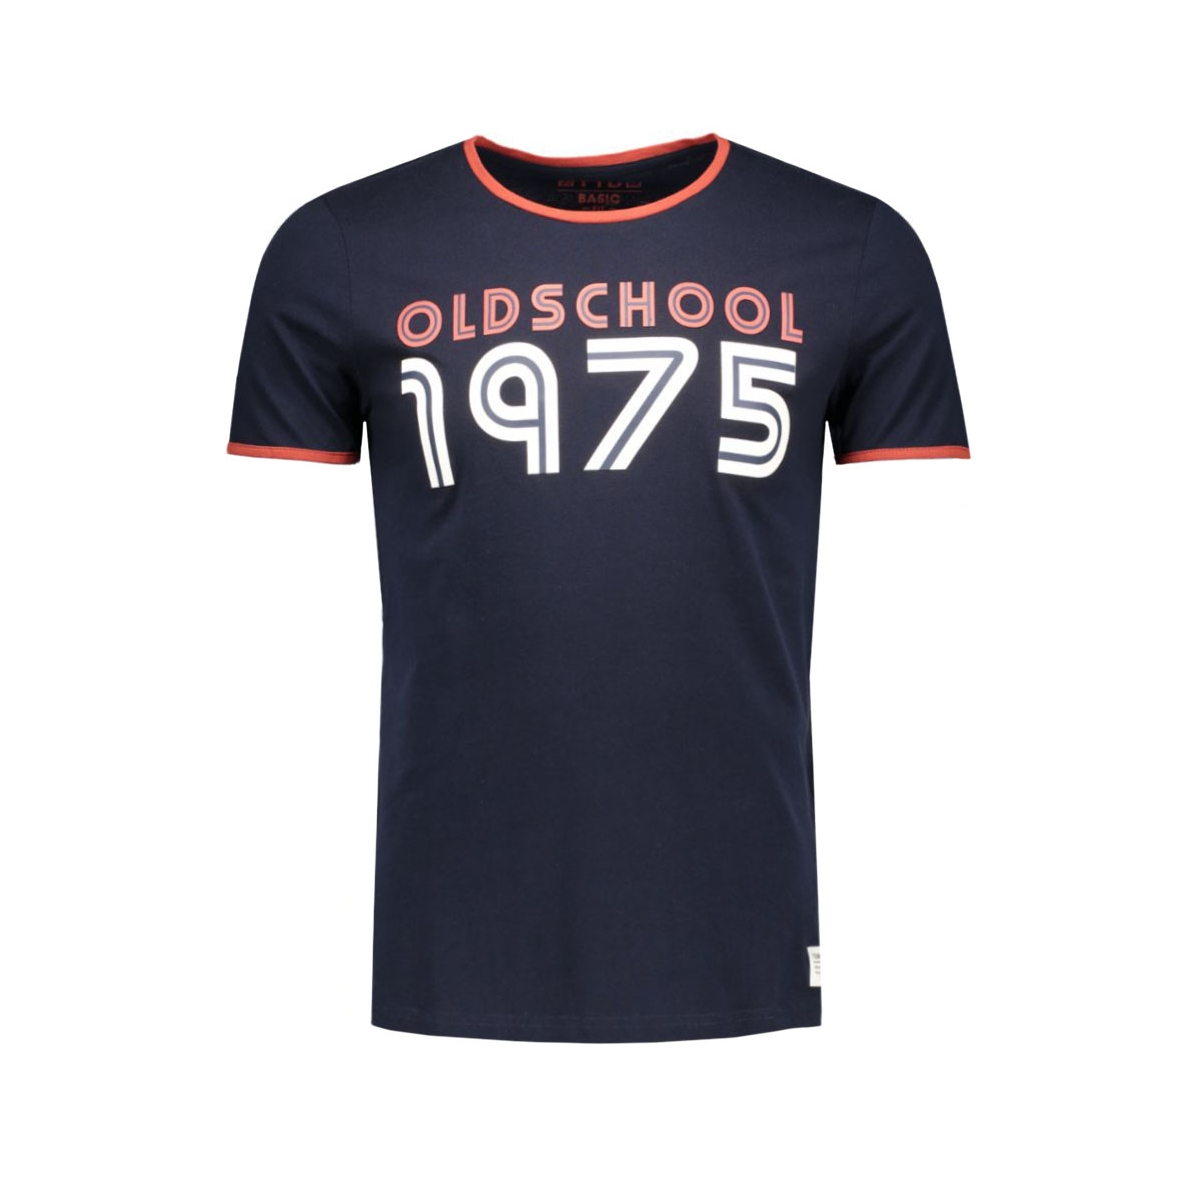 1035825.00.12 tom tailor t-shirt 6576